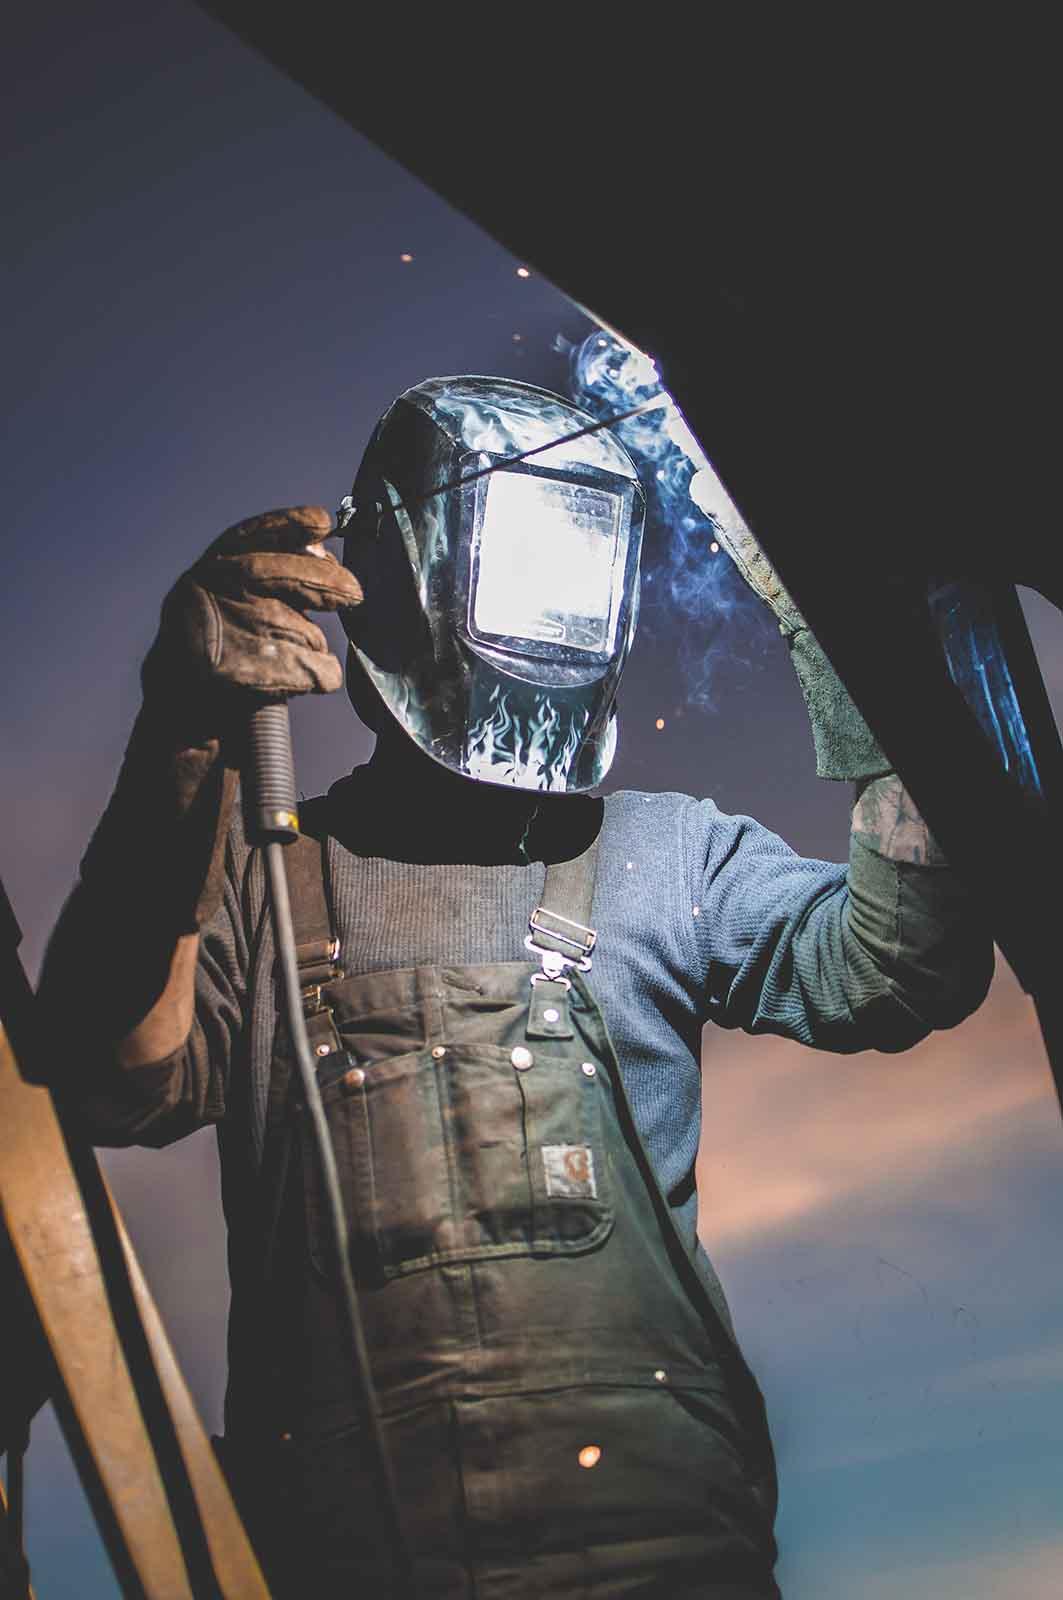 mobile-welding-toronto-10312019-02a